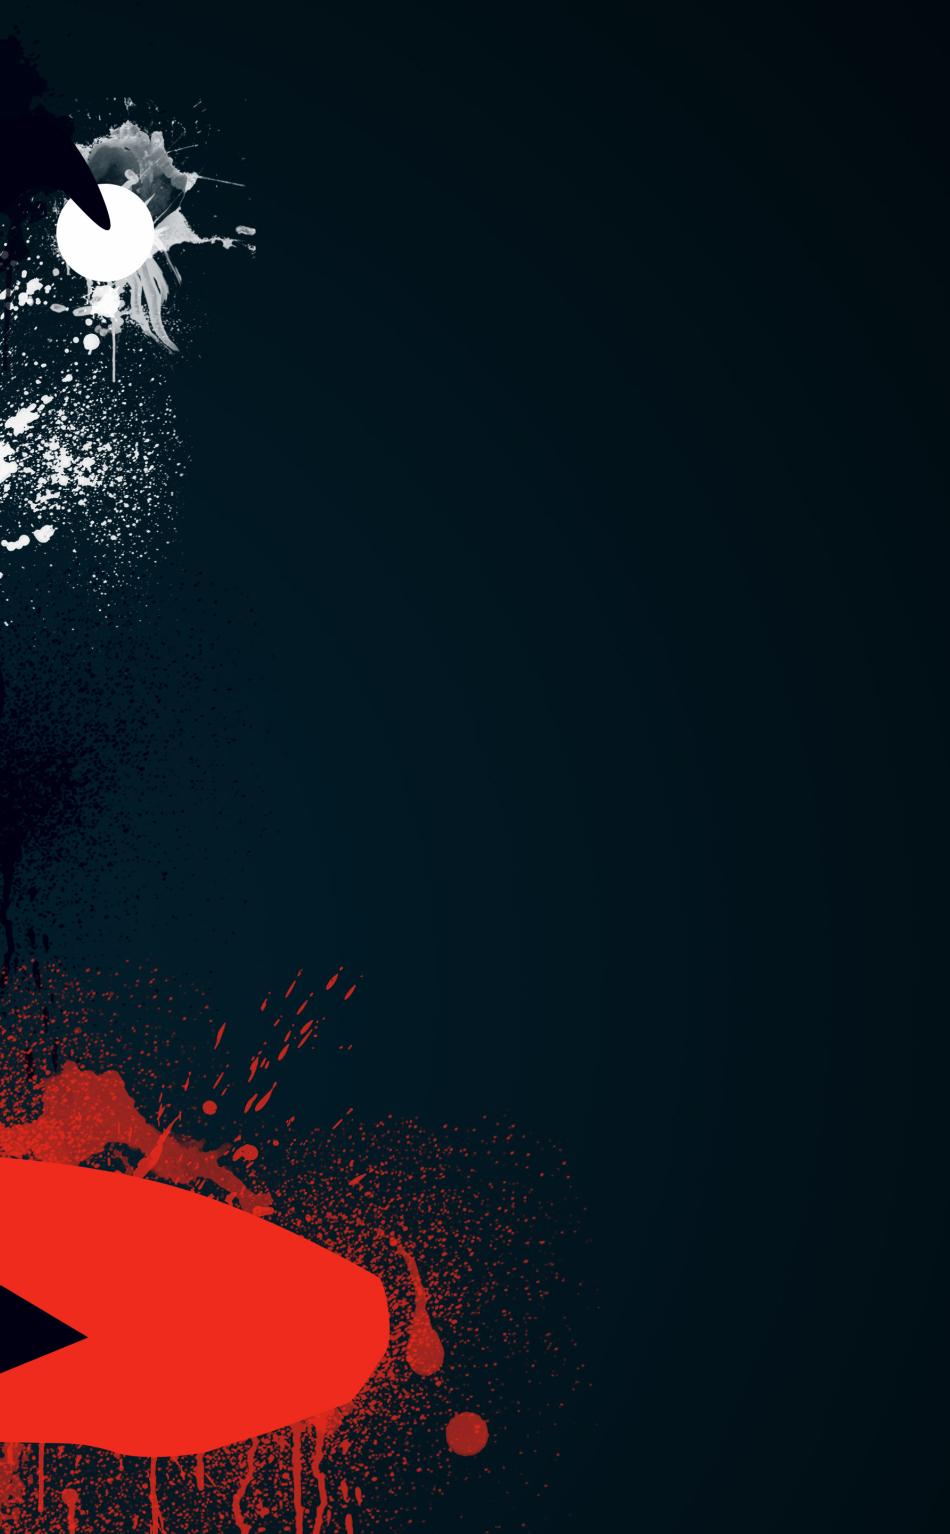 Download Harley Quinn Comic Artwork 1440x2560help Resolution Hd 4k